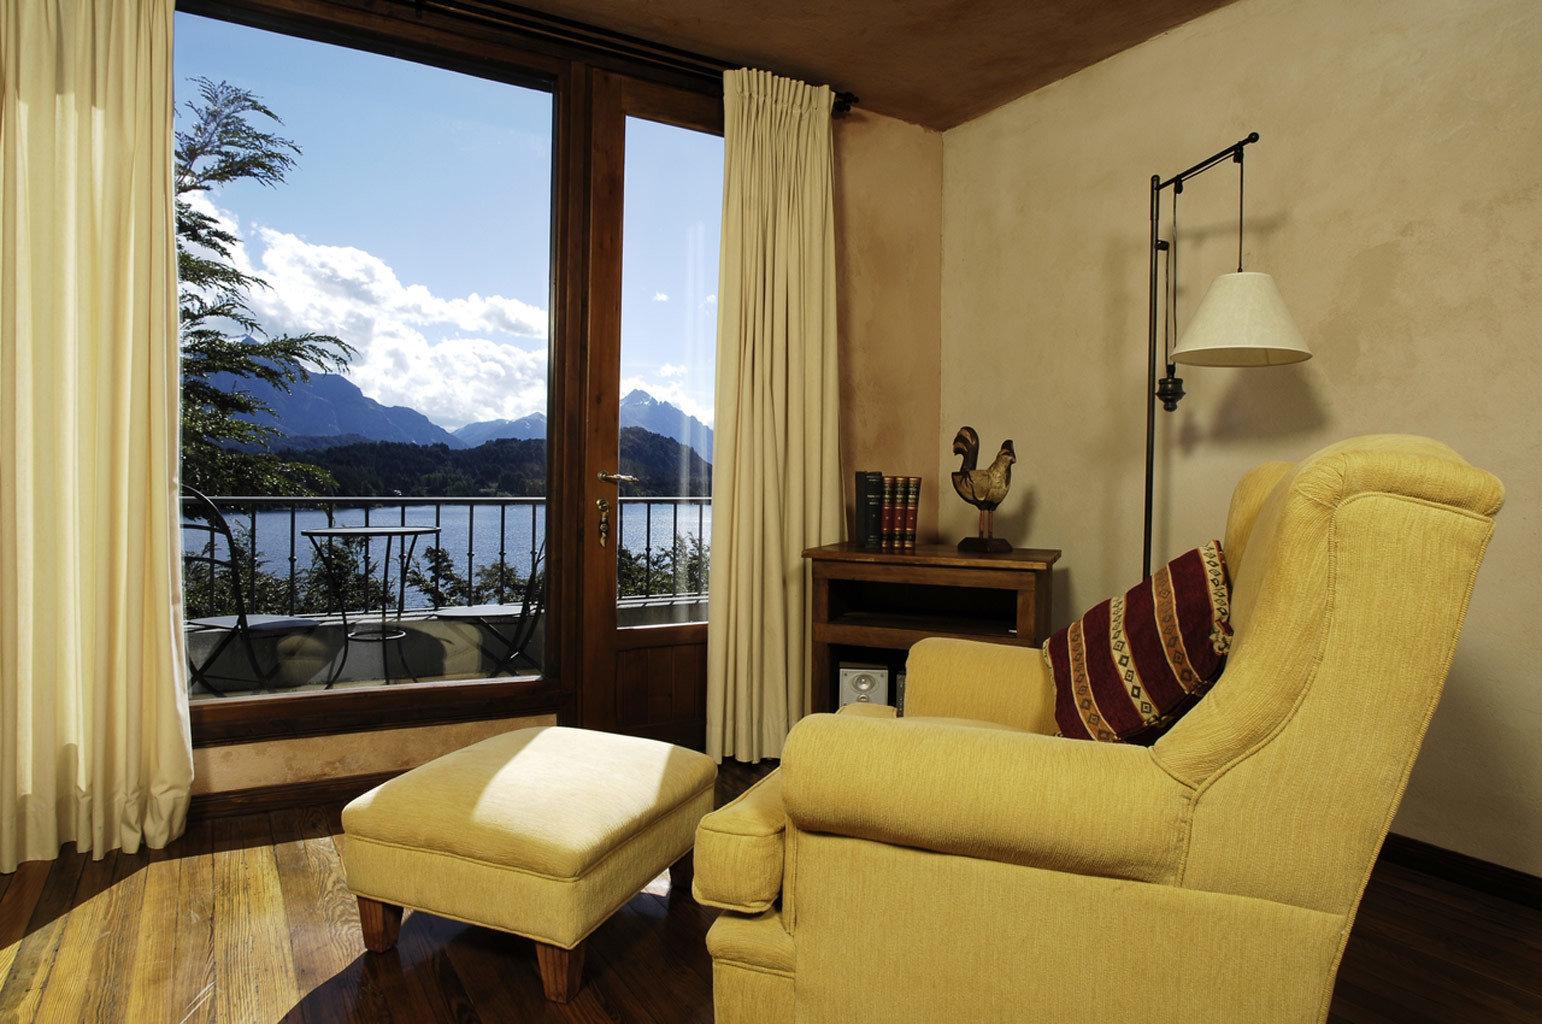 Balcony Bedroom Classic Scenic views sofa property living room house home Suite cottage Villa condominium